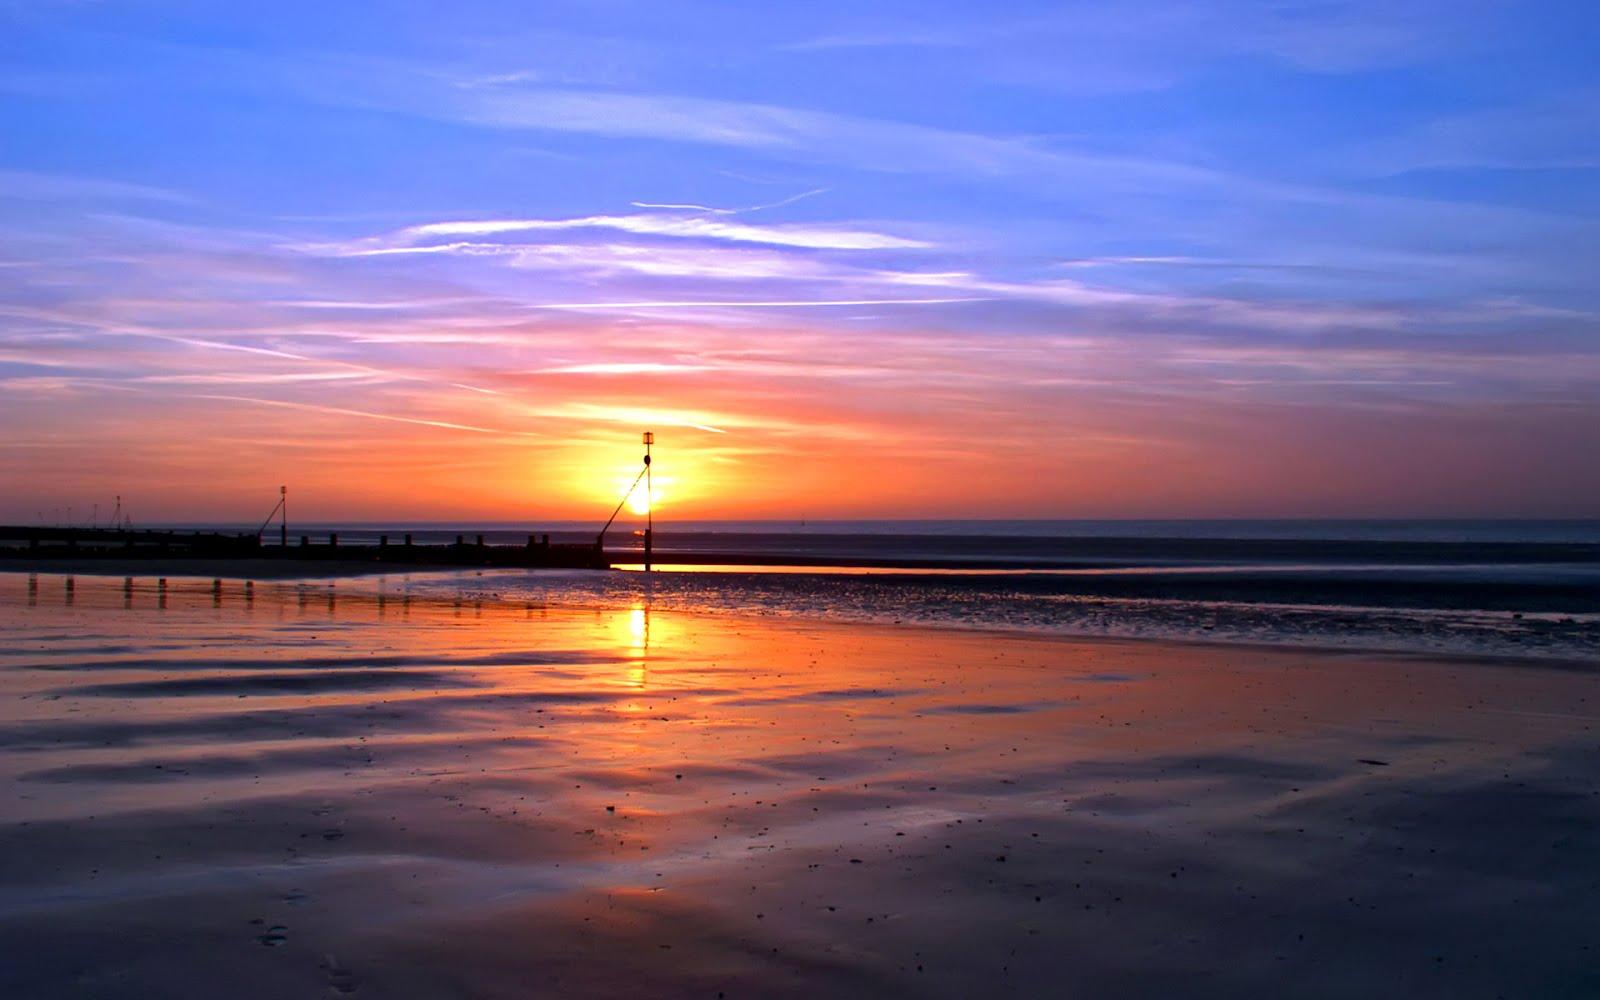 Sunset Beach Wallpapers - Wallpapers HD